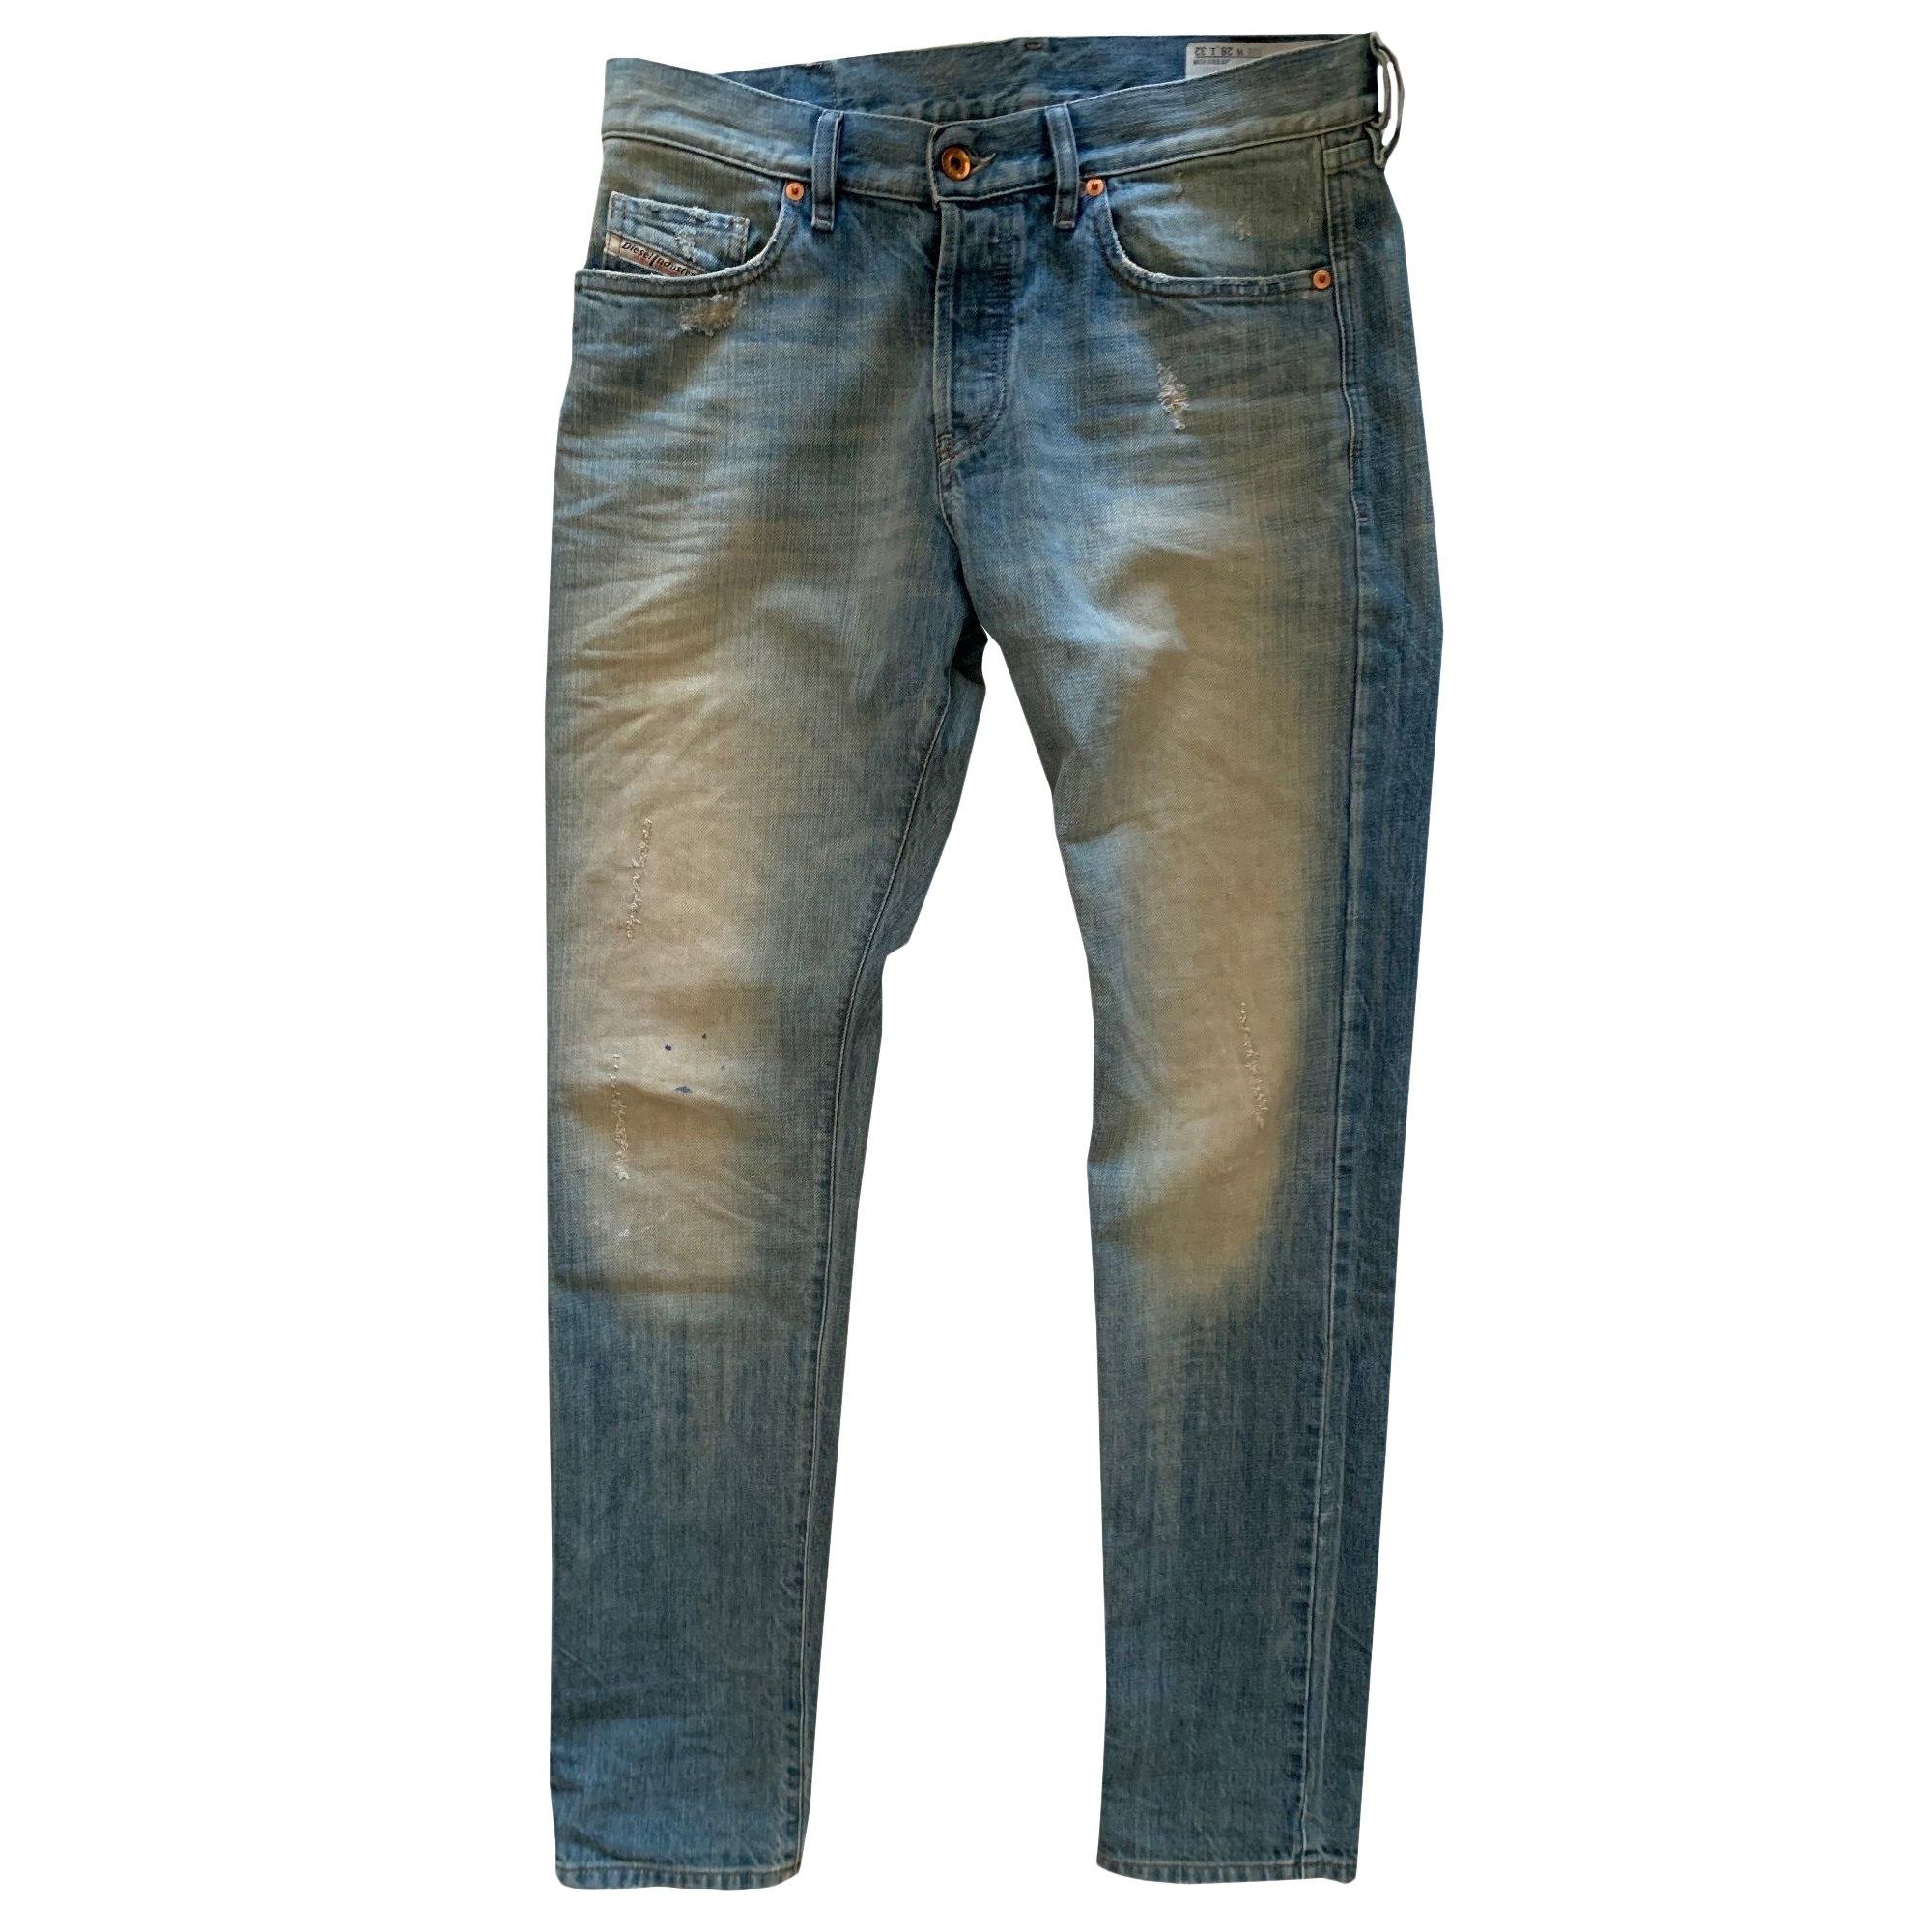 Jeans large, boyfriend DIESEL Bleu, bleu marine, bleu turquoise